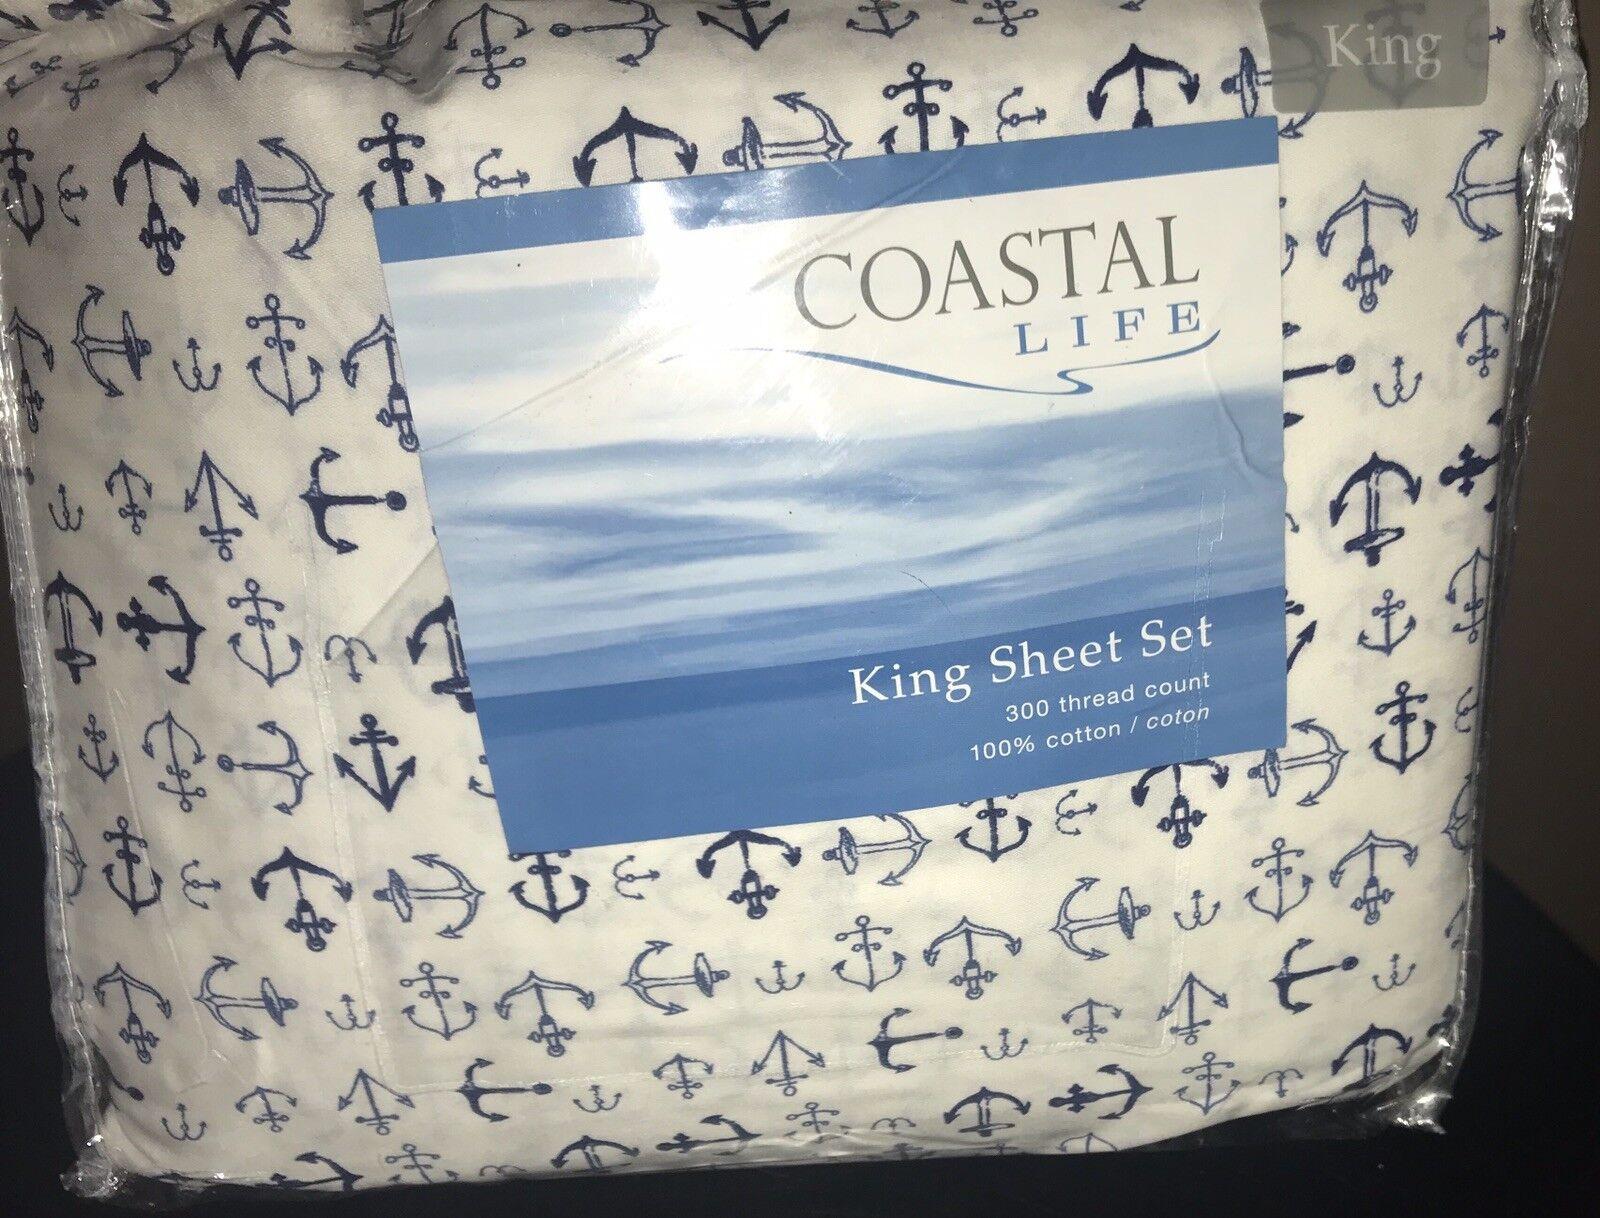 COASTAL LIFE Anchor 300-Thread Count Sheet Set (KING SIZE)